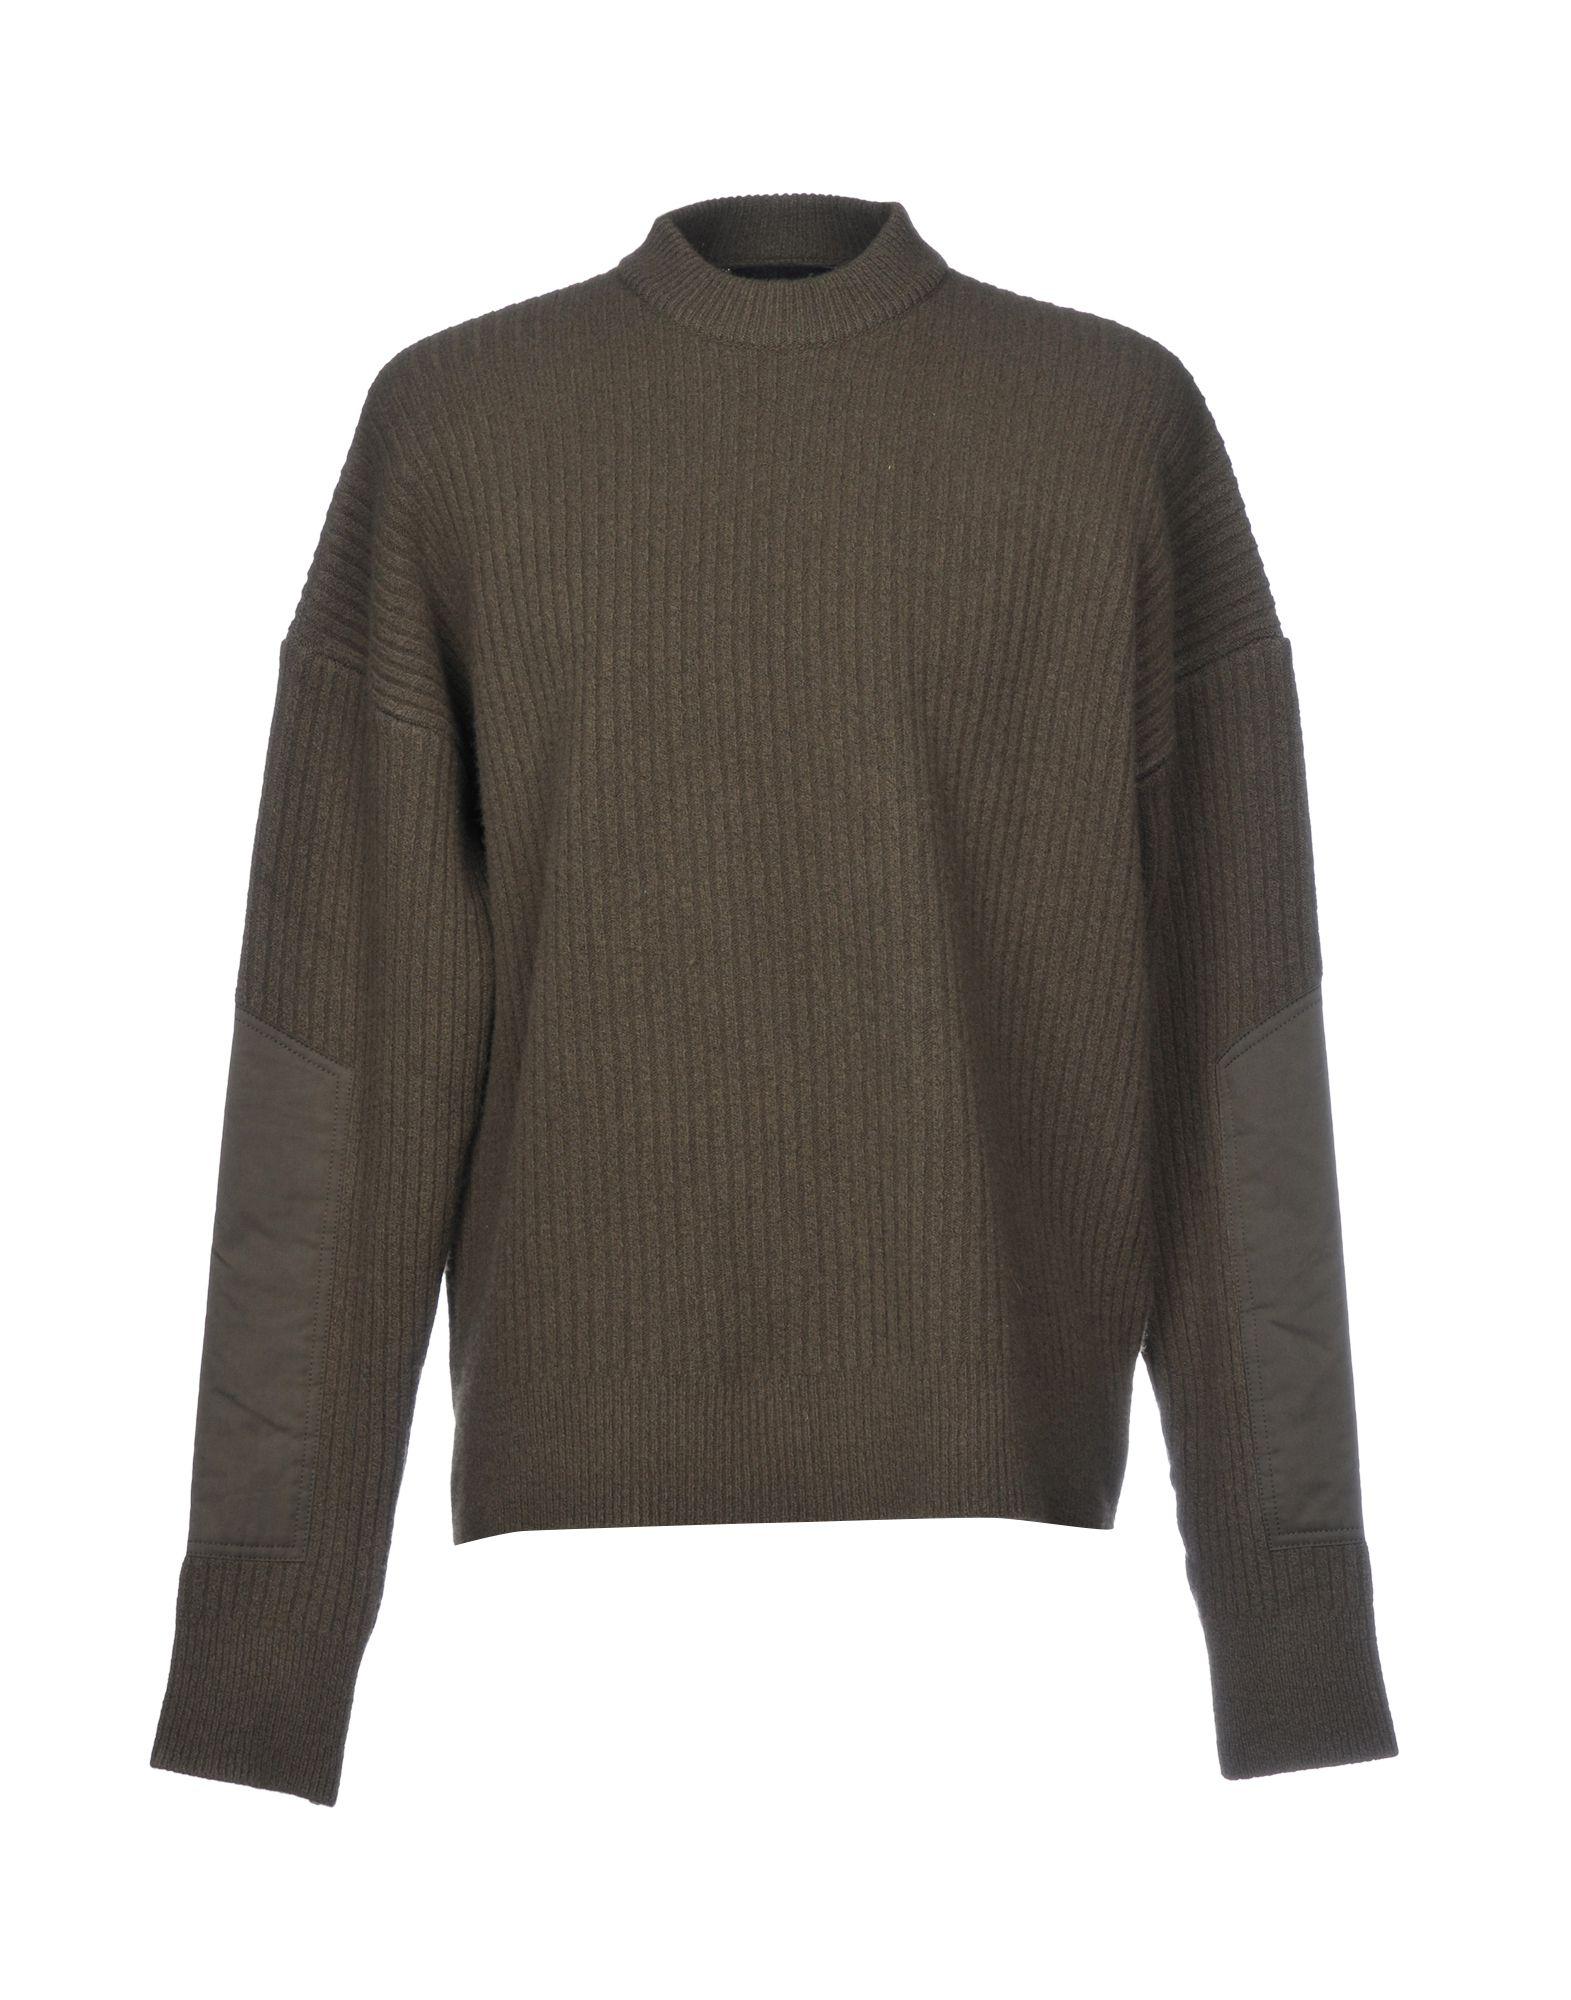 DIESEL BLACK GOLD Свитер diesel black gold свитер